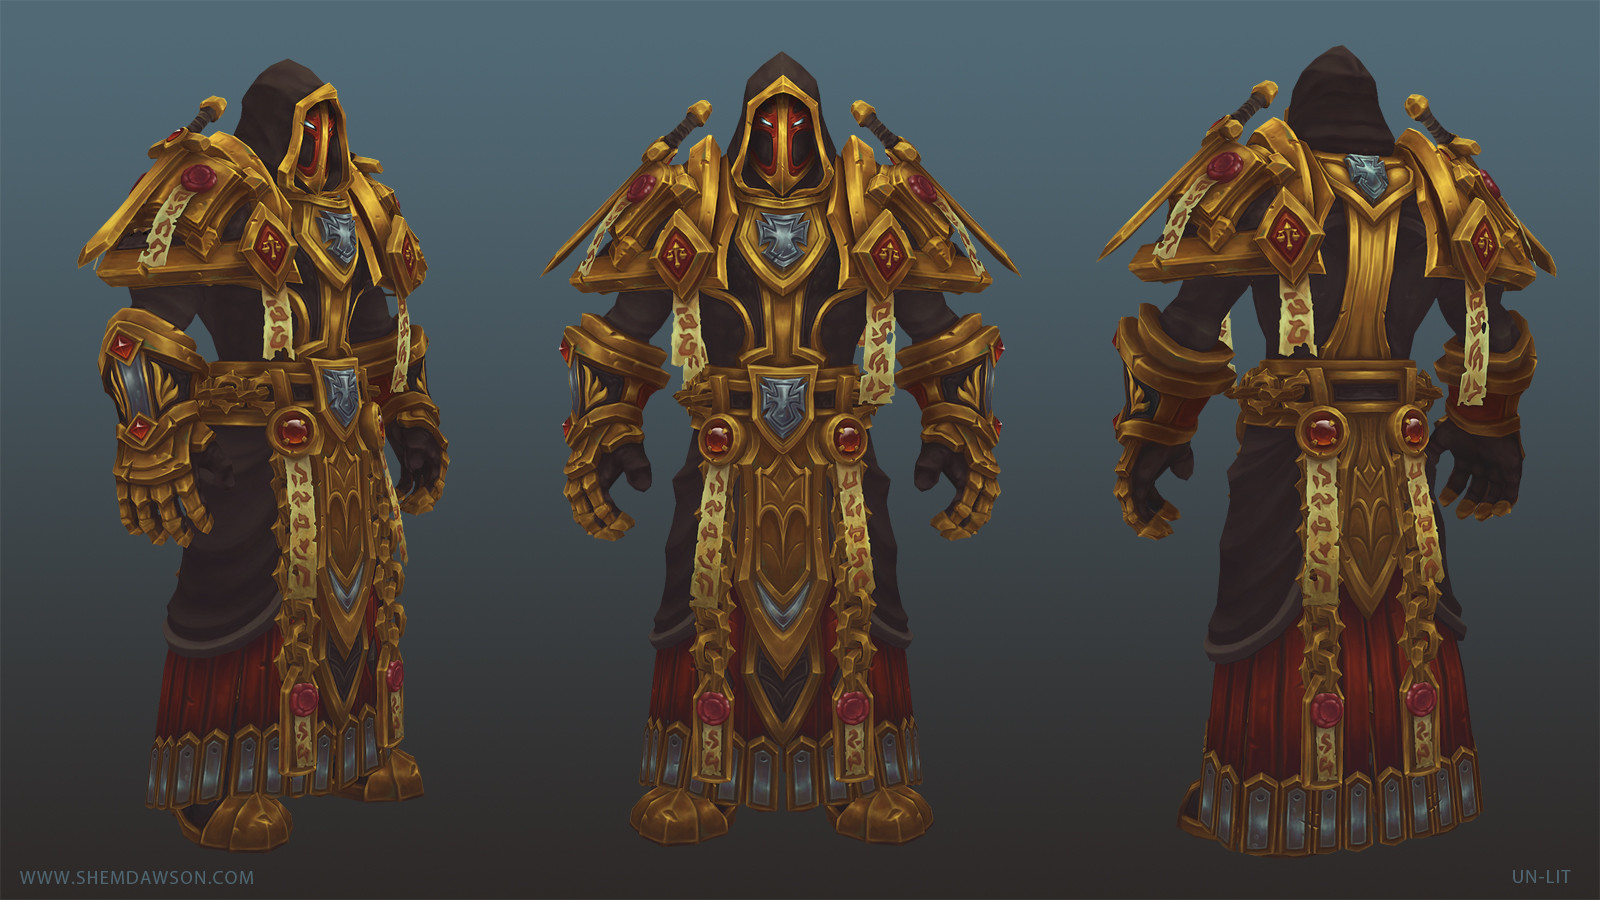 Paladin Tier ArmorMaybe 21 Judgment Amazing qSpVGUMz